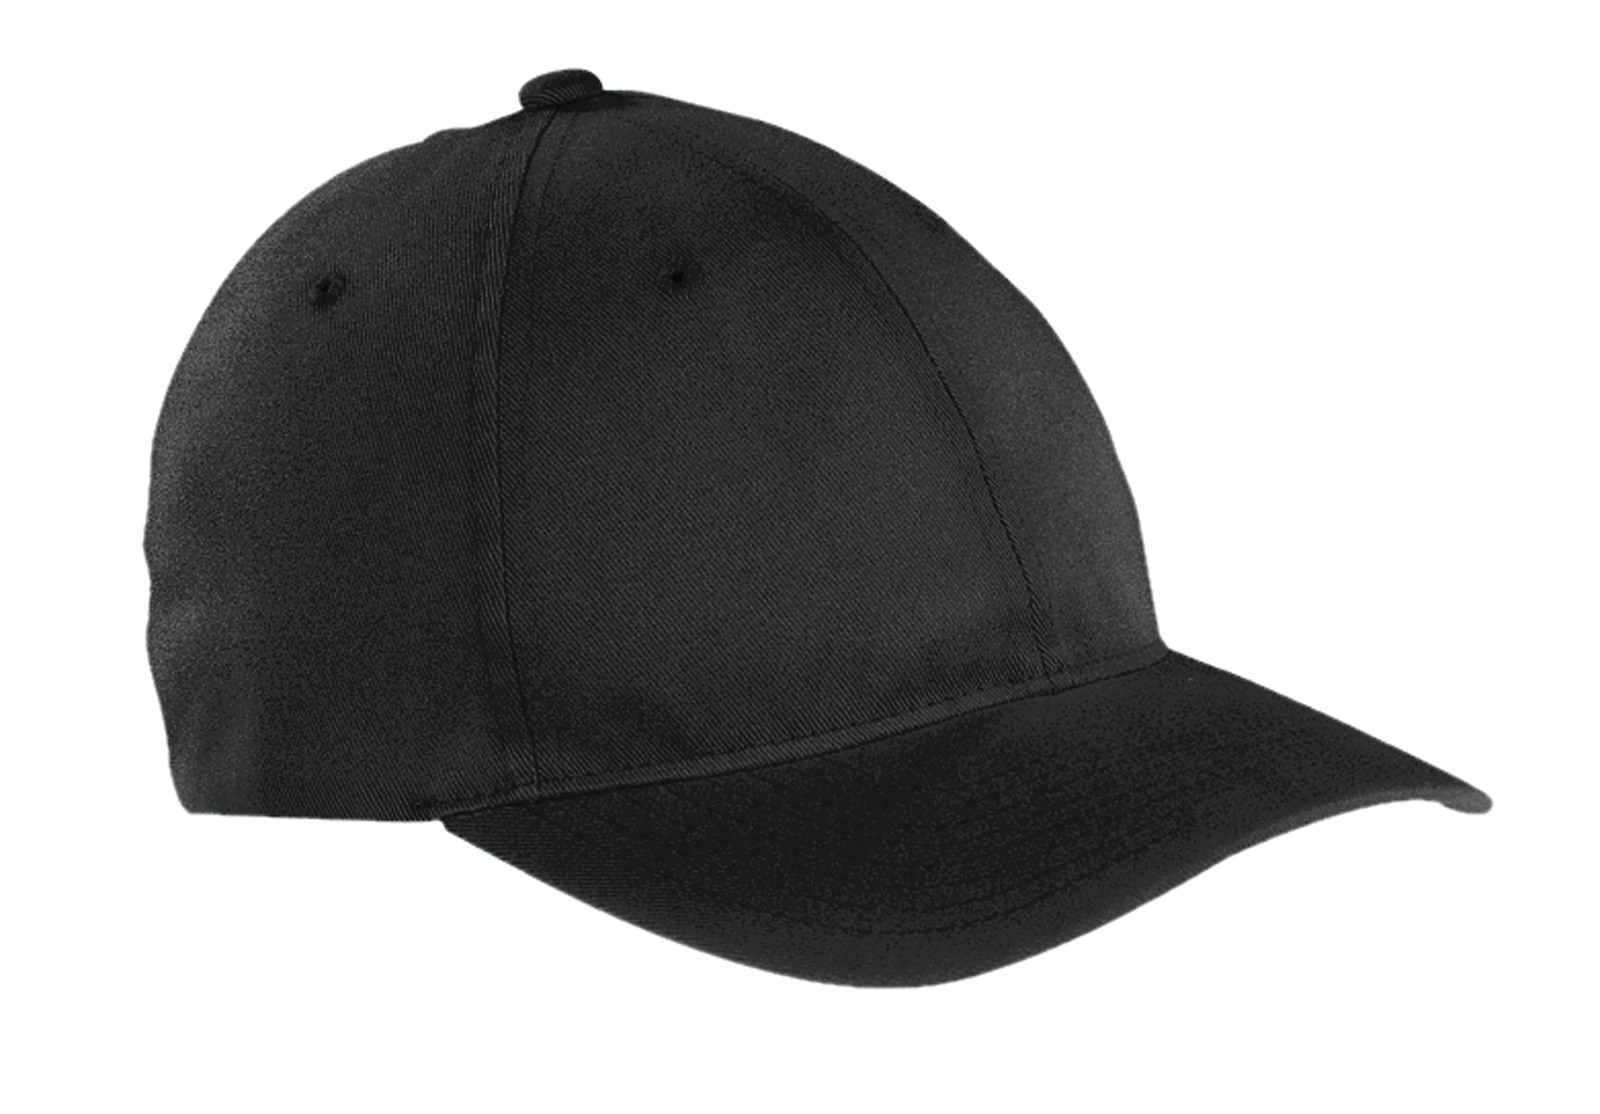 Adult Garment-Washed Cotton Cap